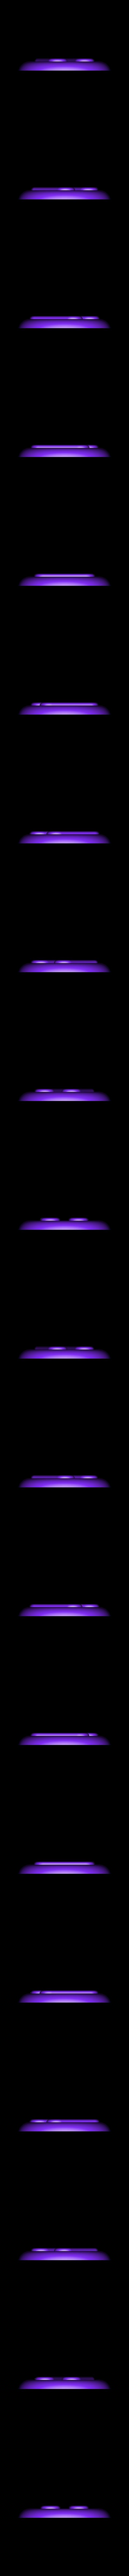 SeeUPauseButtonBin.stl Download STL file SeeU Buttons • 3D printable template, Laramaine